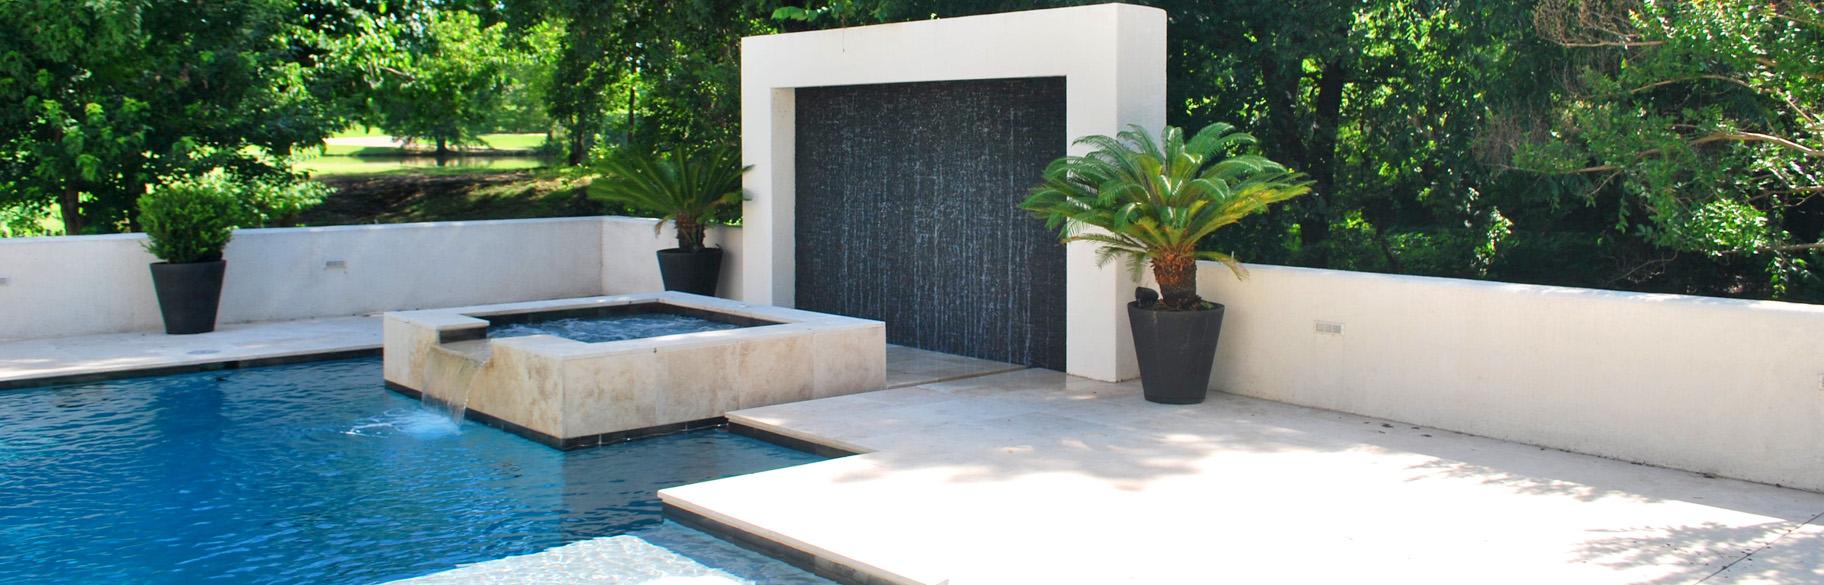 Pools & Patios 4